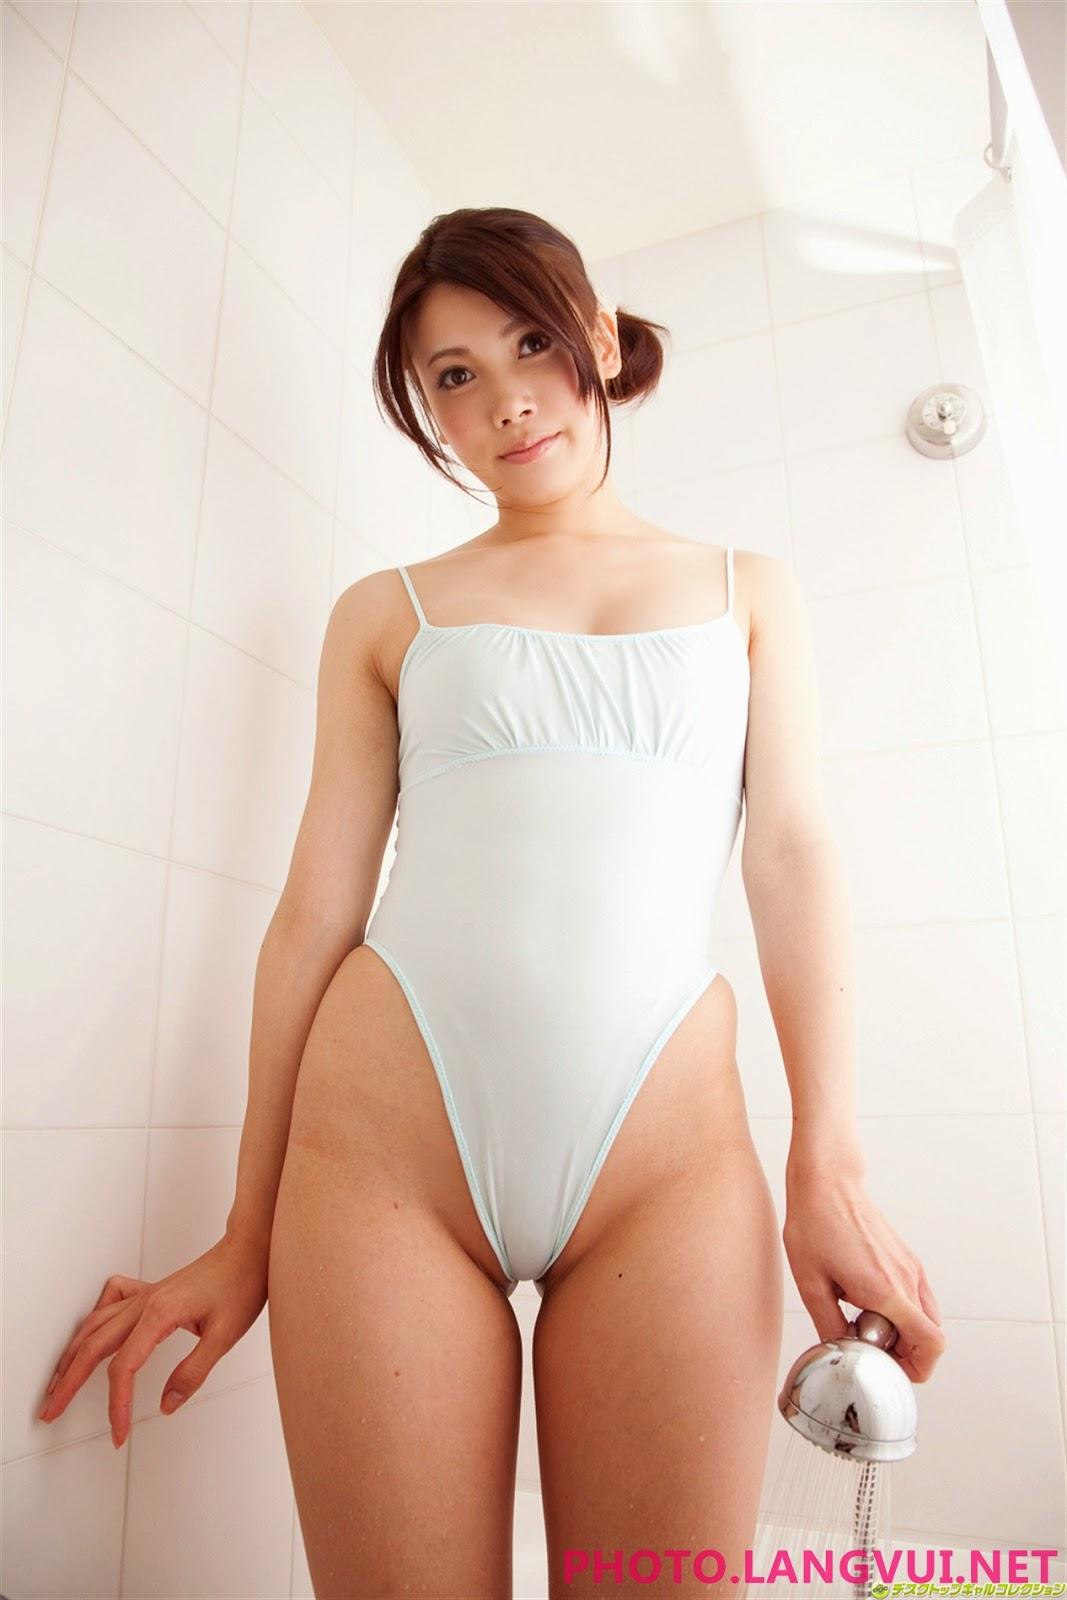 DGC No-1106 Akemi Horiuchi - Page 4 of 11 - Ảnh Girl Xinh